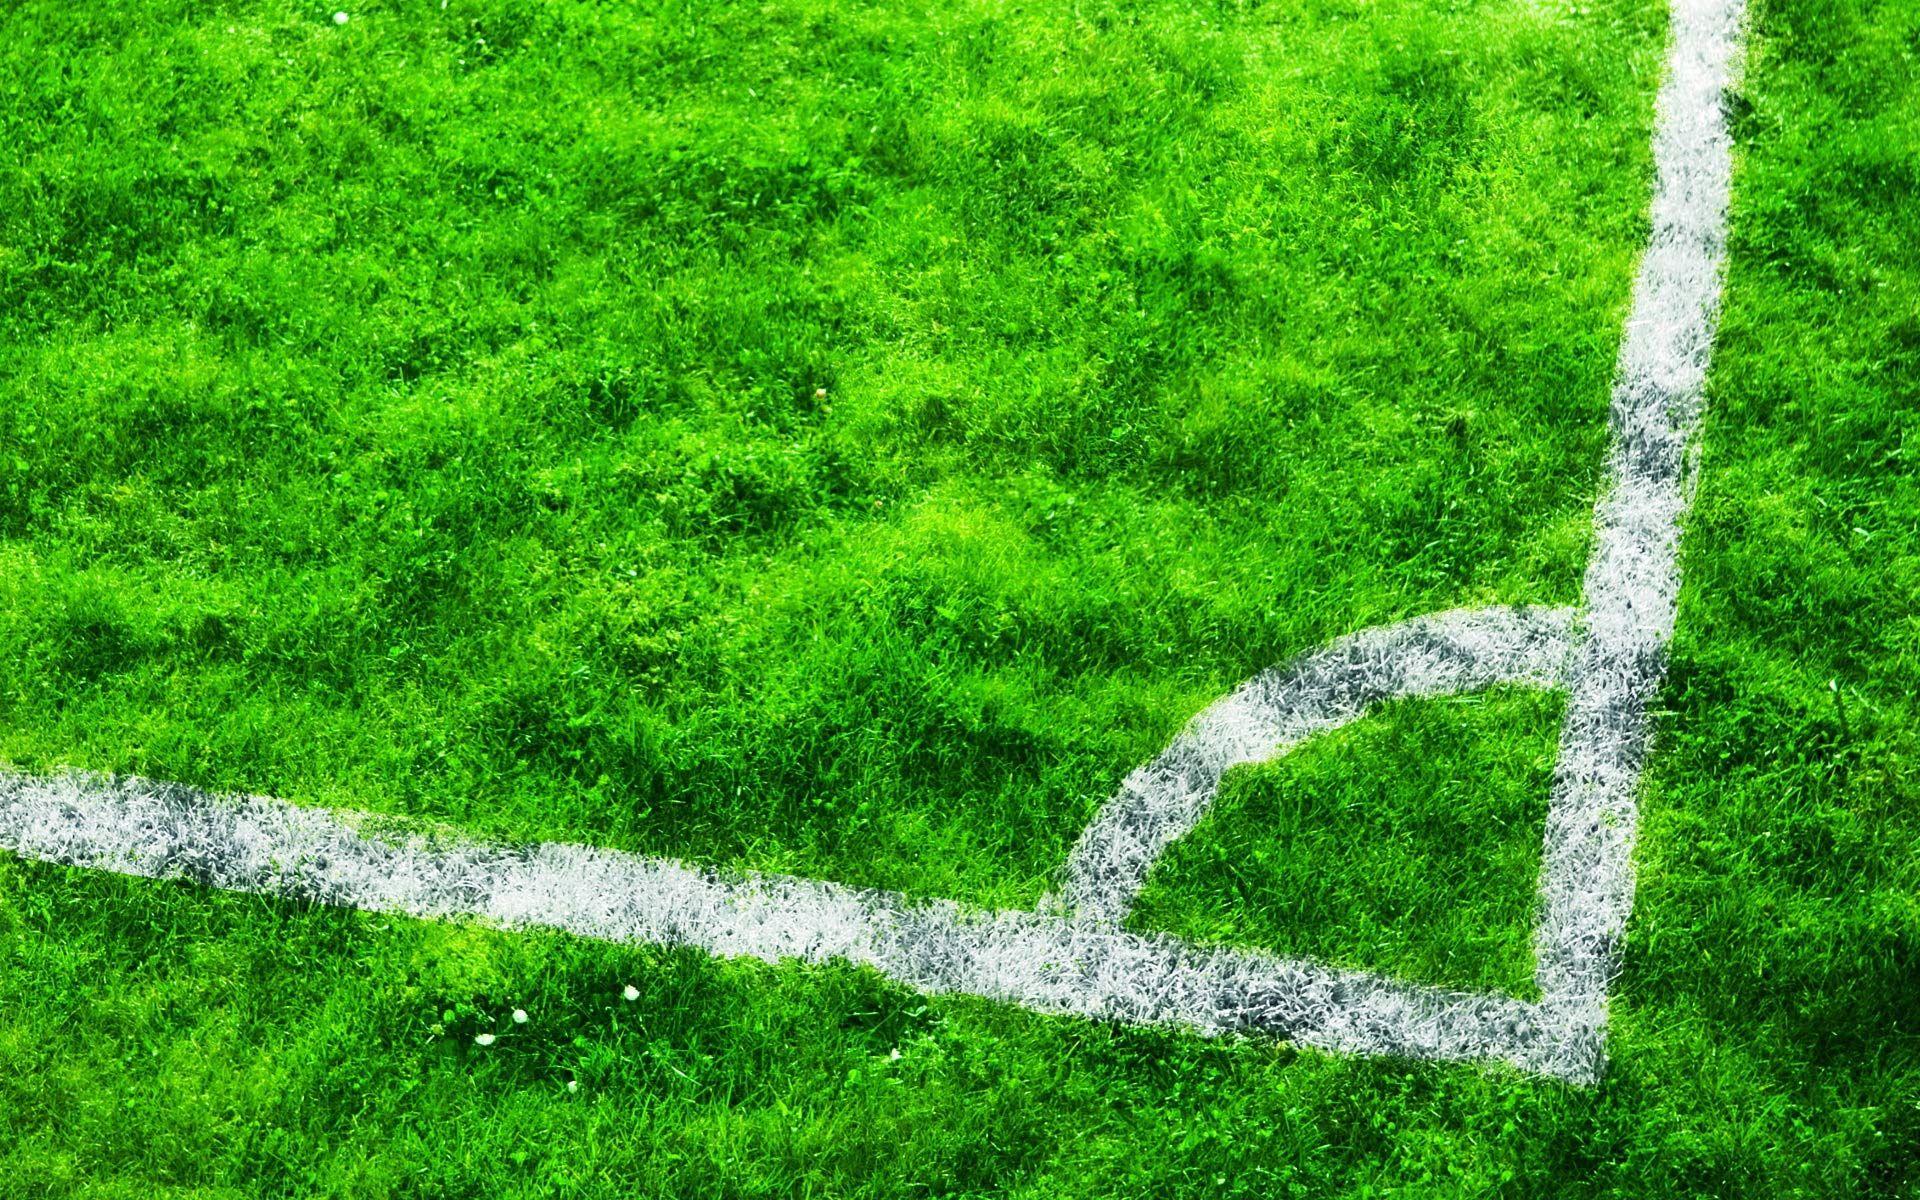 Desktop Gallery Computers Football Corner 1600x900px High Def Desktop Background Computers Gallery Foot Football Wallpaper Field Wallpaper Sports Wallpapers